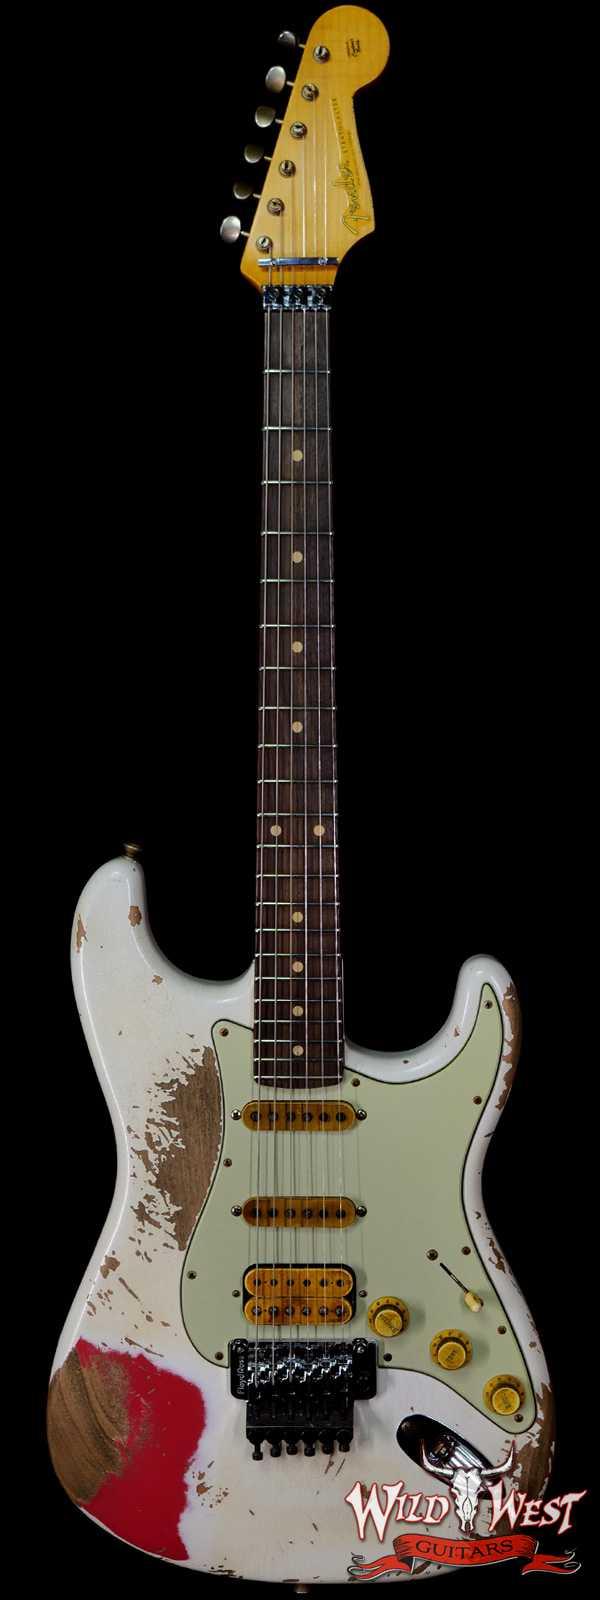 Fender Custom Shop Wild West White Lightning Stratocaster Floyd Rose Heavy Relic Rosewood Board 22 Frets Fiesta Red